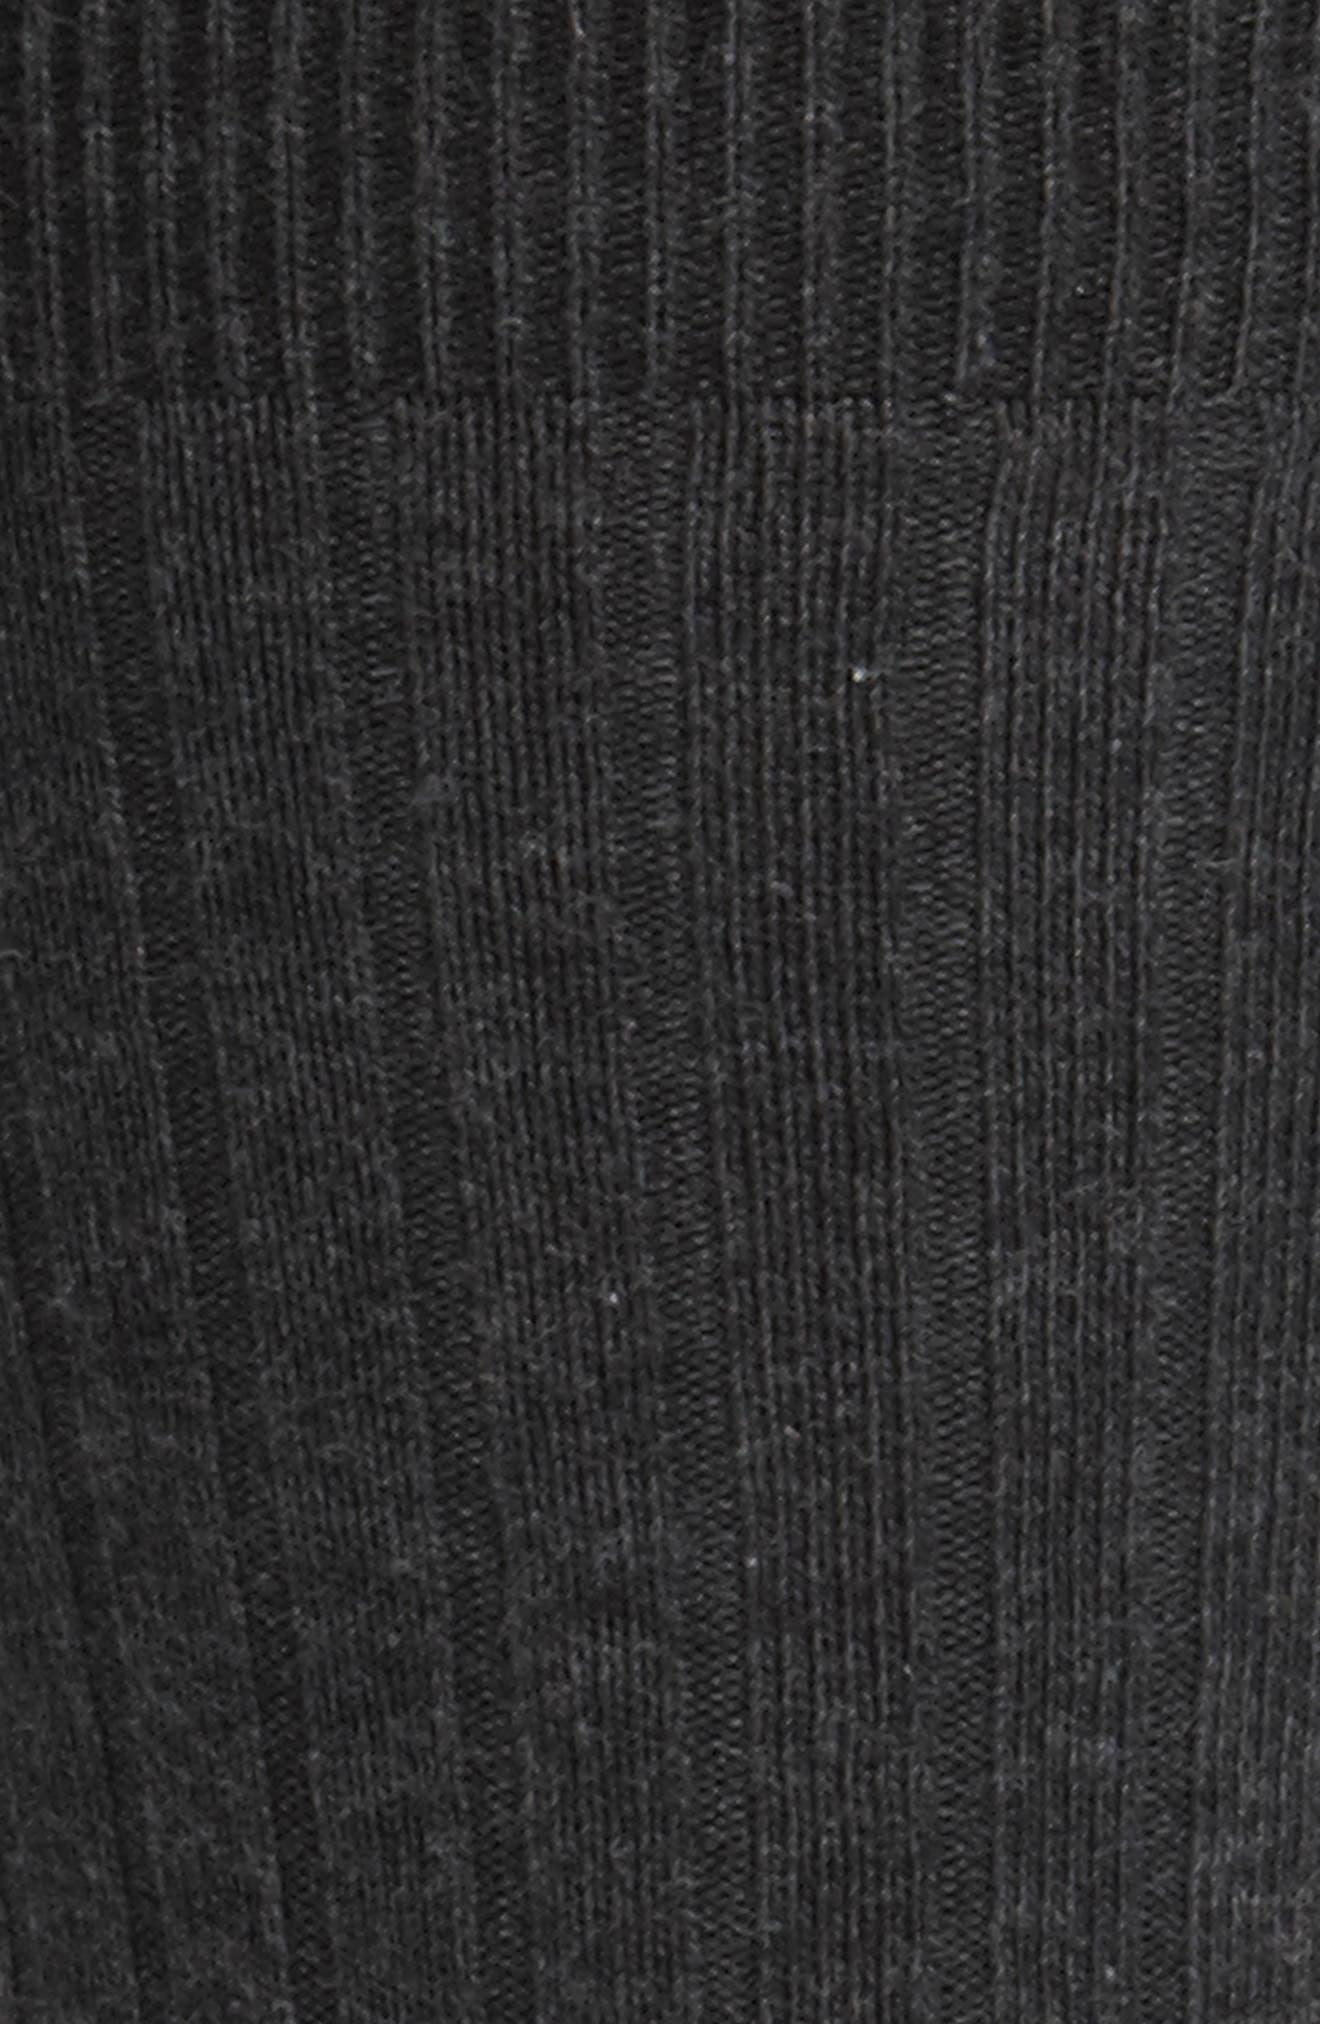 Cotton Blend Socks,                             Alternate thumbnail 2, color,                             002